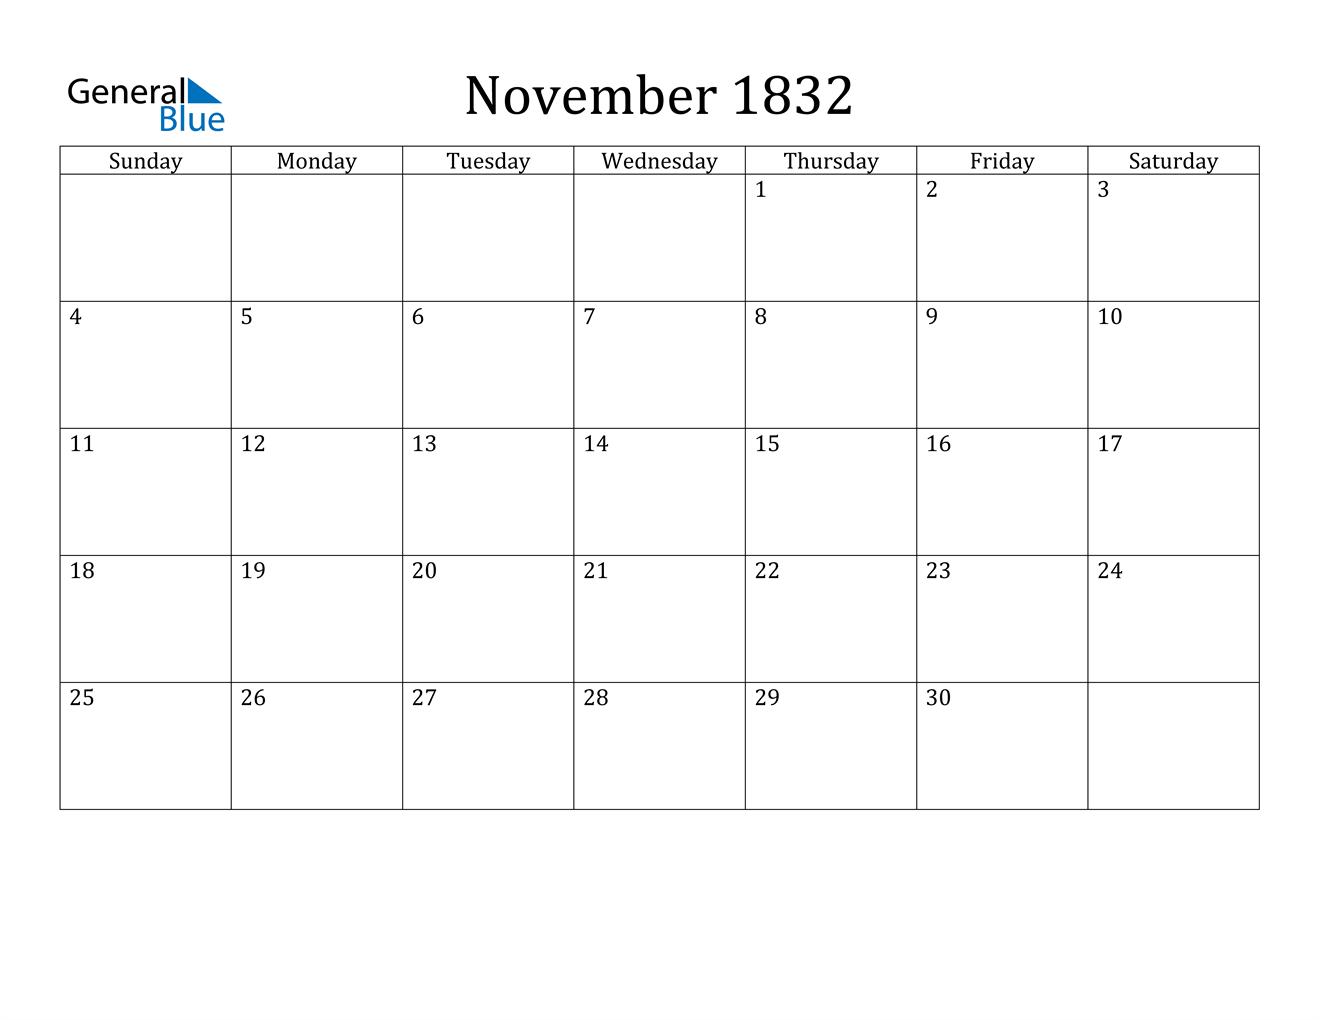 Image of November 1832 Calendar